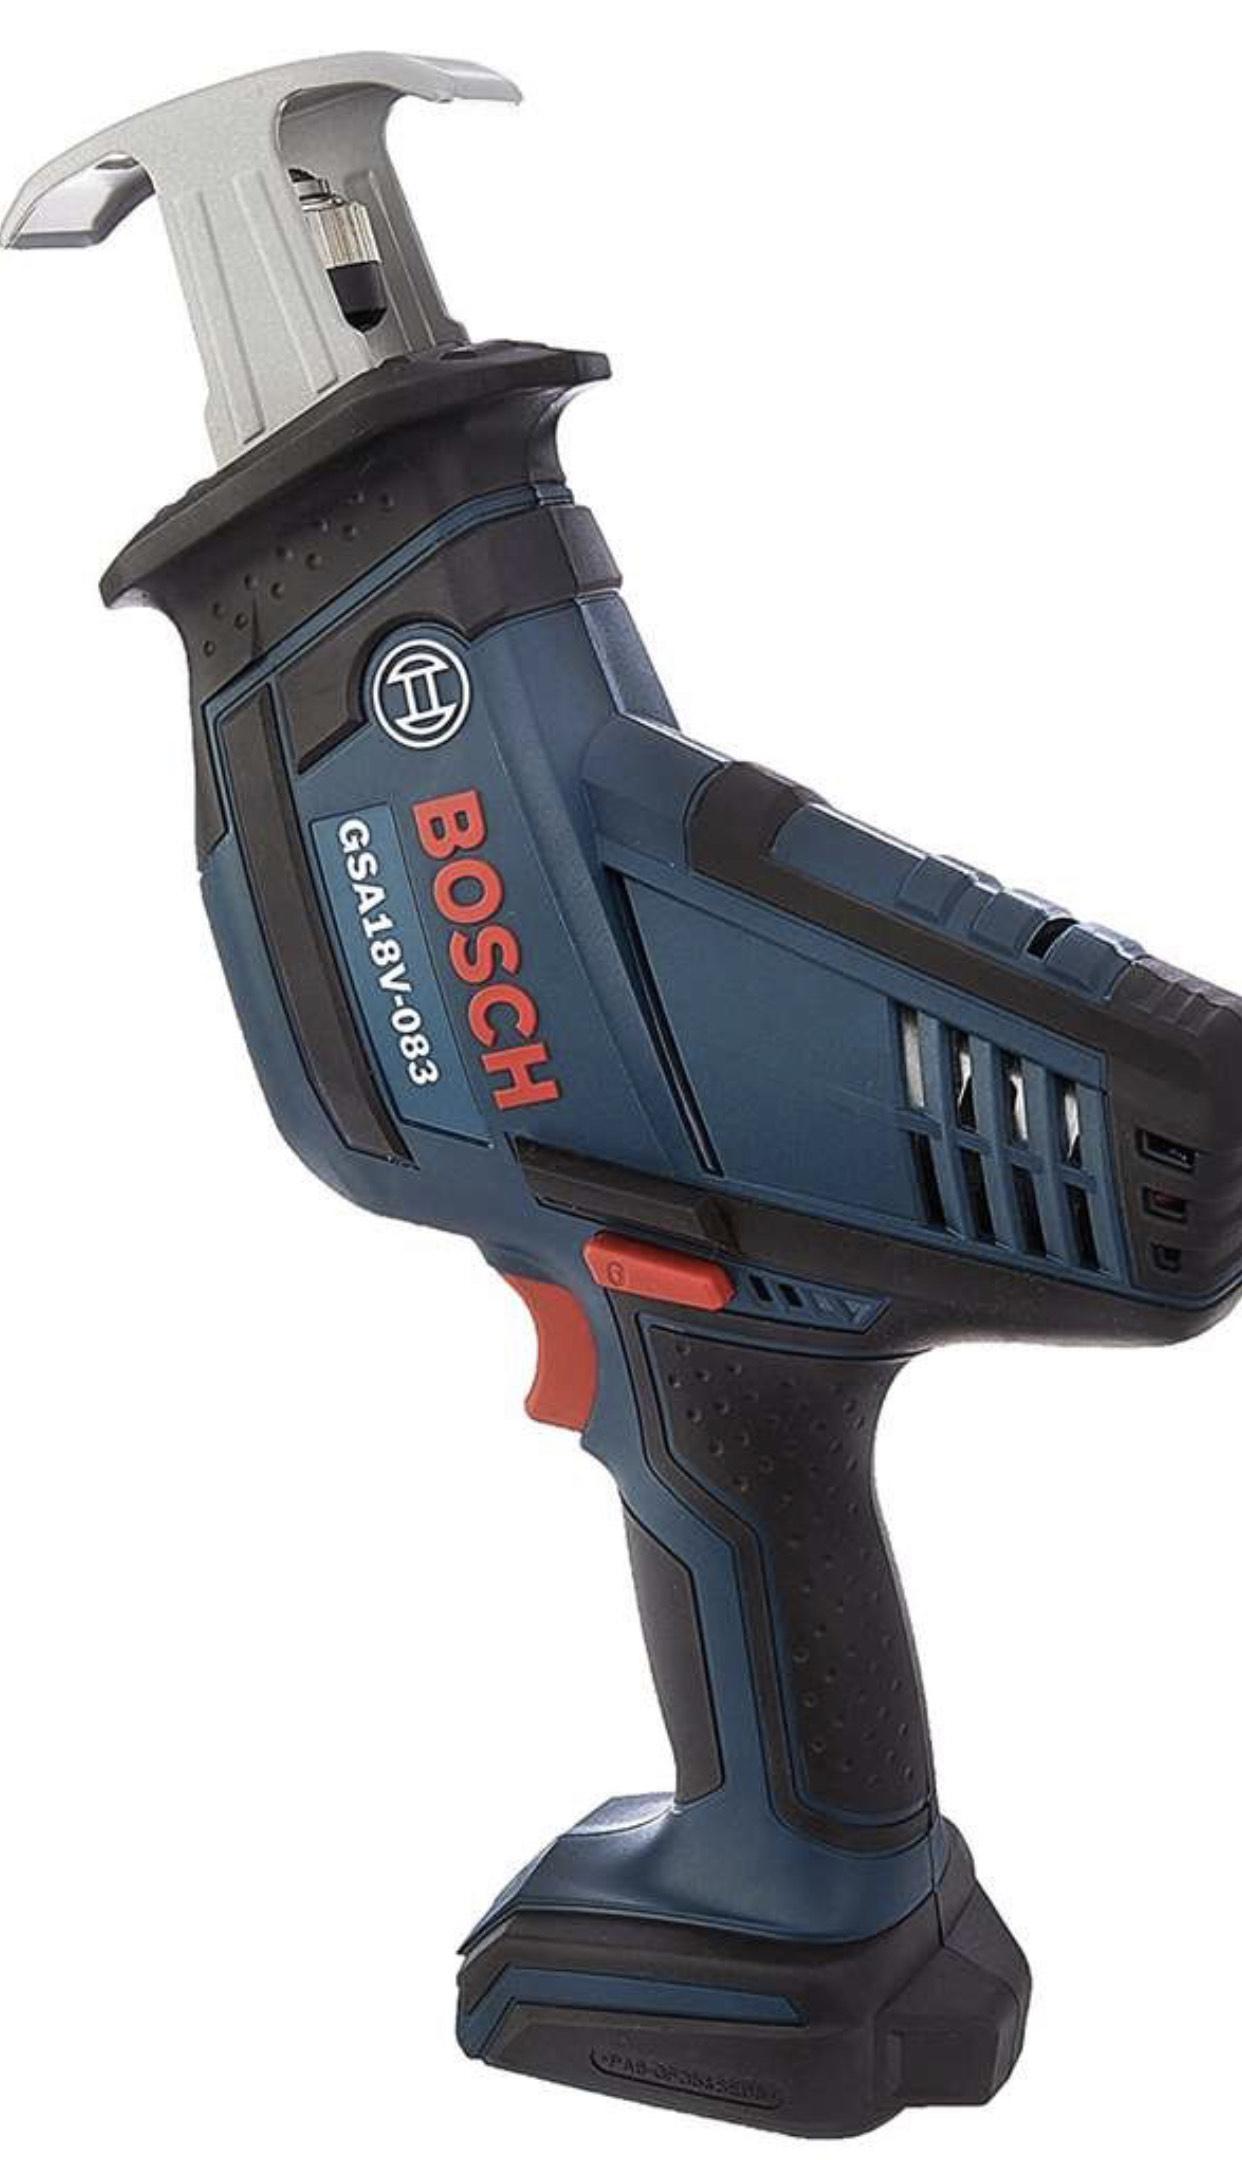 BOSCH GSA18V-083B 18 V Compact Reciprocating Saw Bare Tool - £86.92 @ Amazon